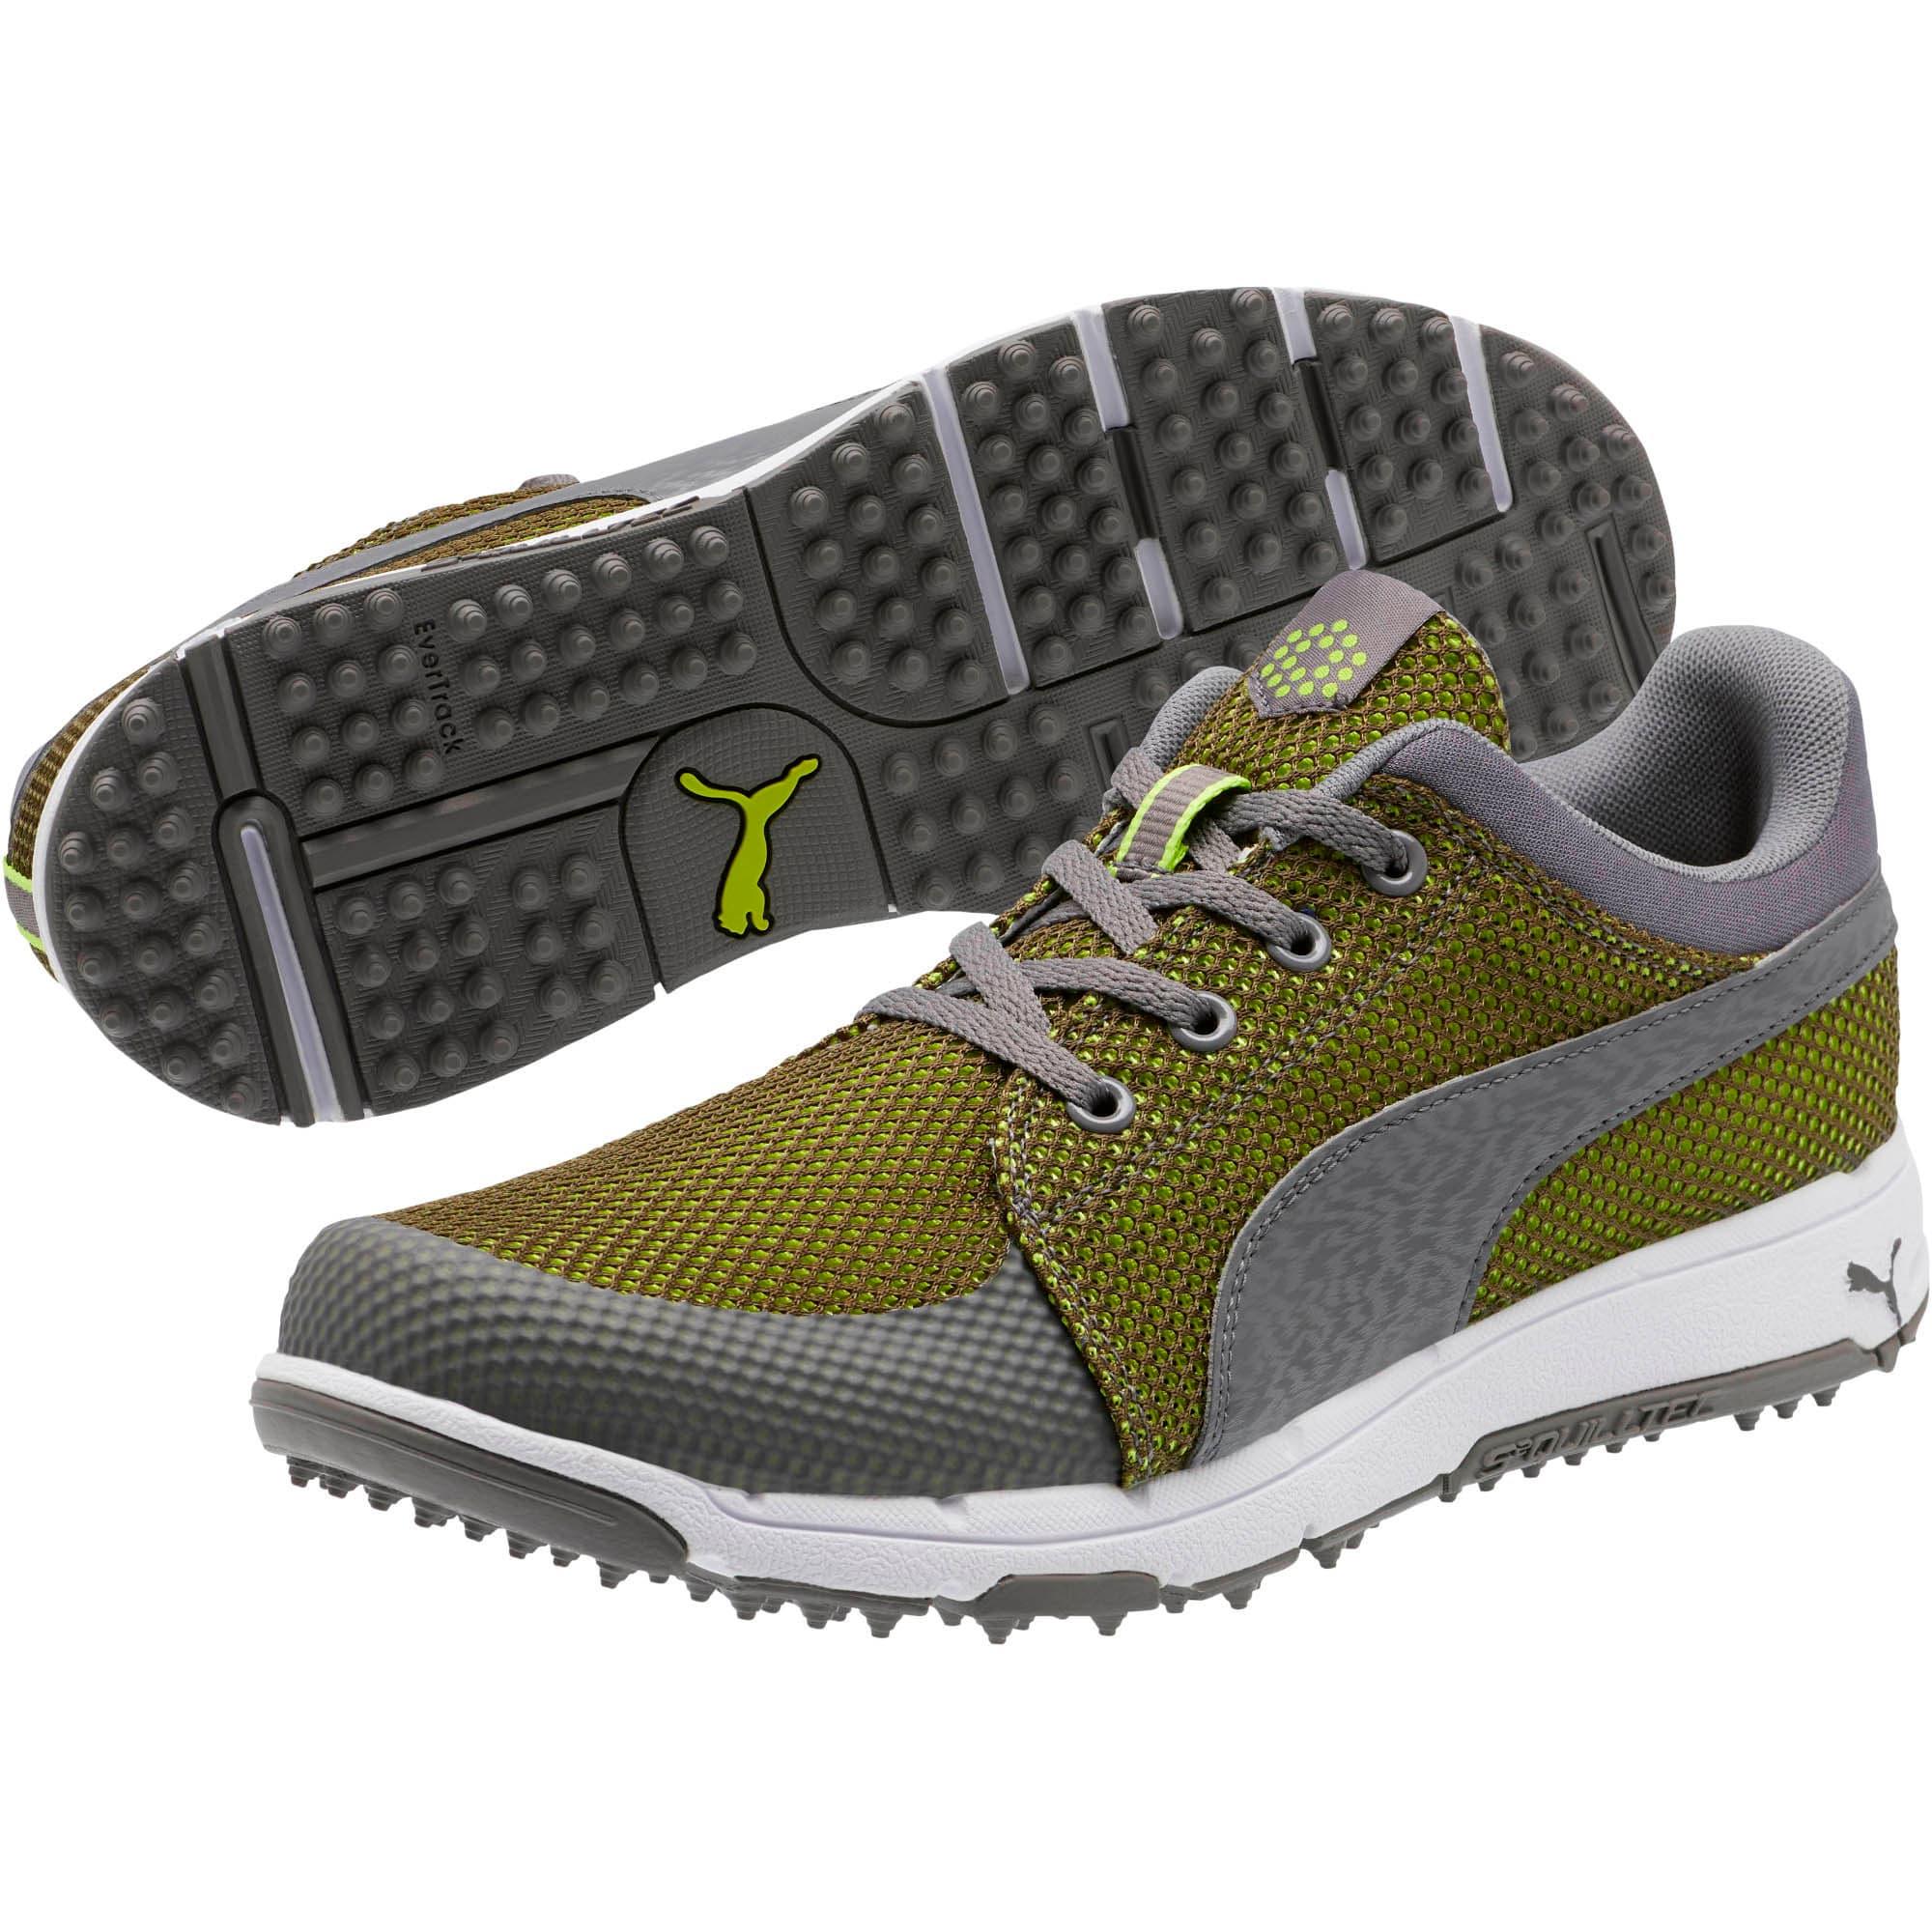 Thumbnail 2 of GRIP Sport Tech Men's Golf Shoes, QUIET SHADE-QUIET SHADE-Lime, medium